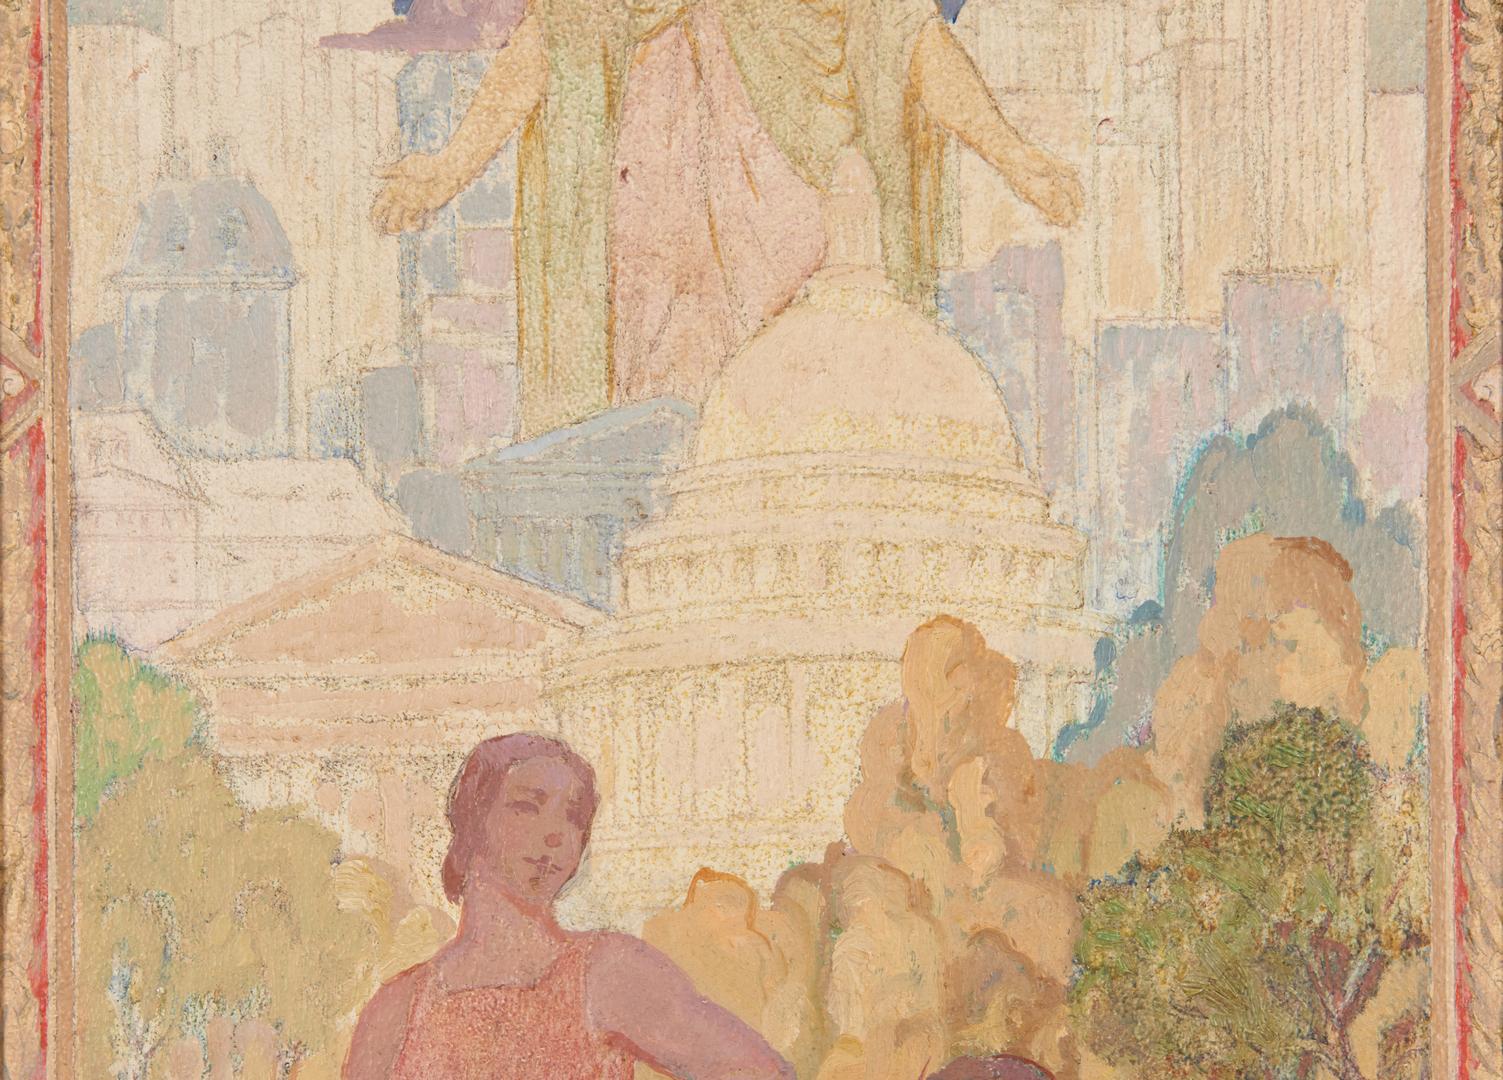 Lot 116: 2 Daniel MacMorris O/B Paintings, Old and New America